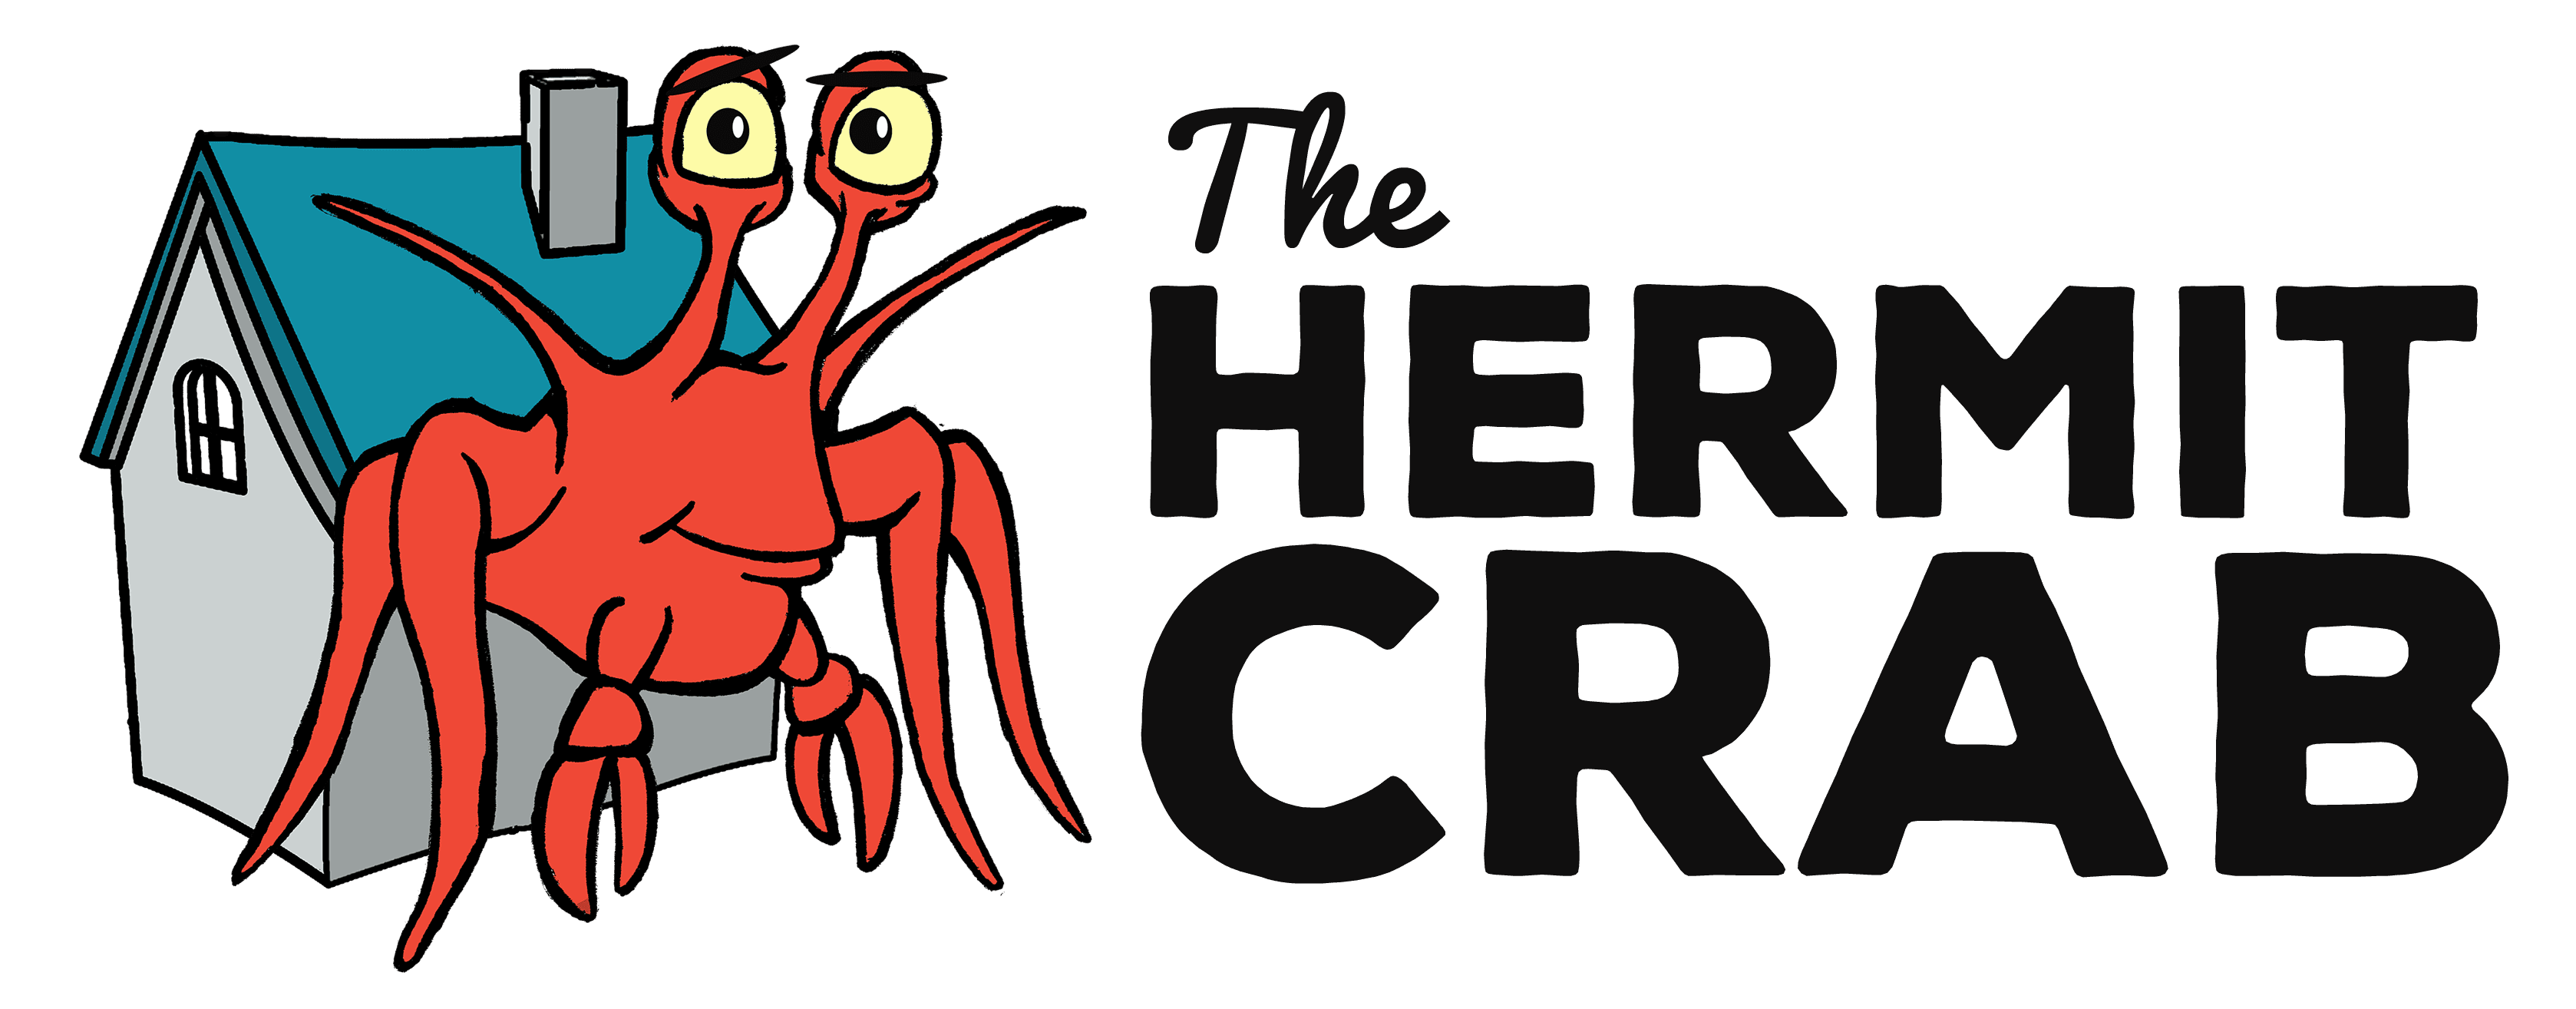 The Hermit Crab.